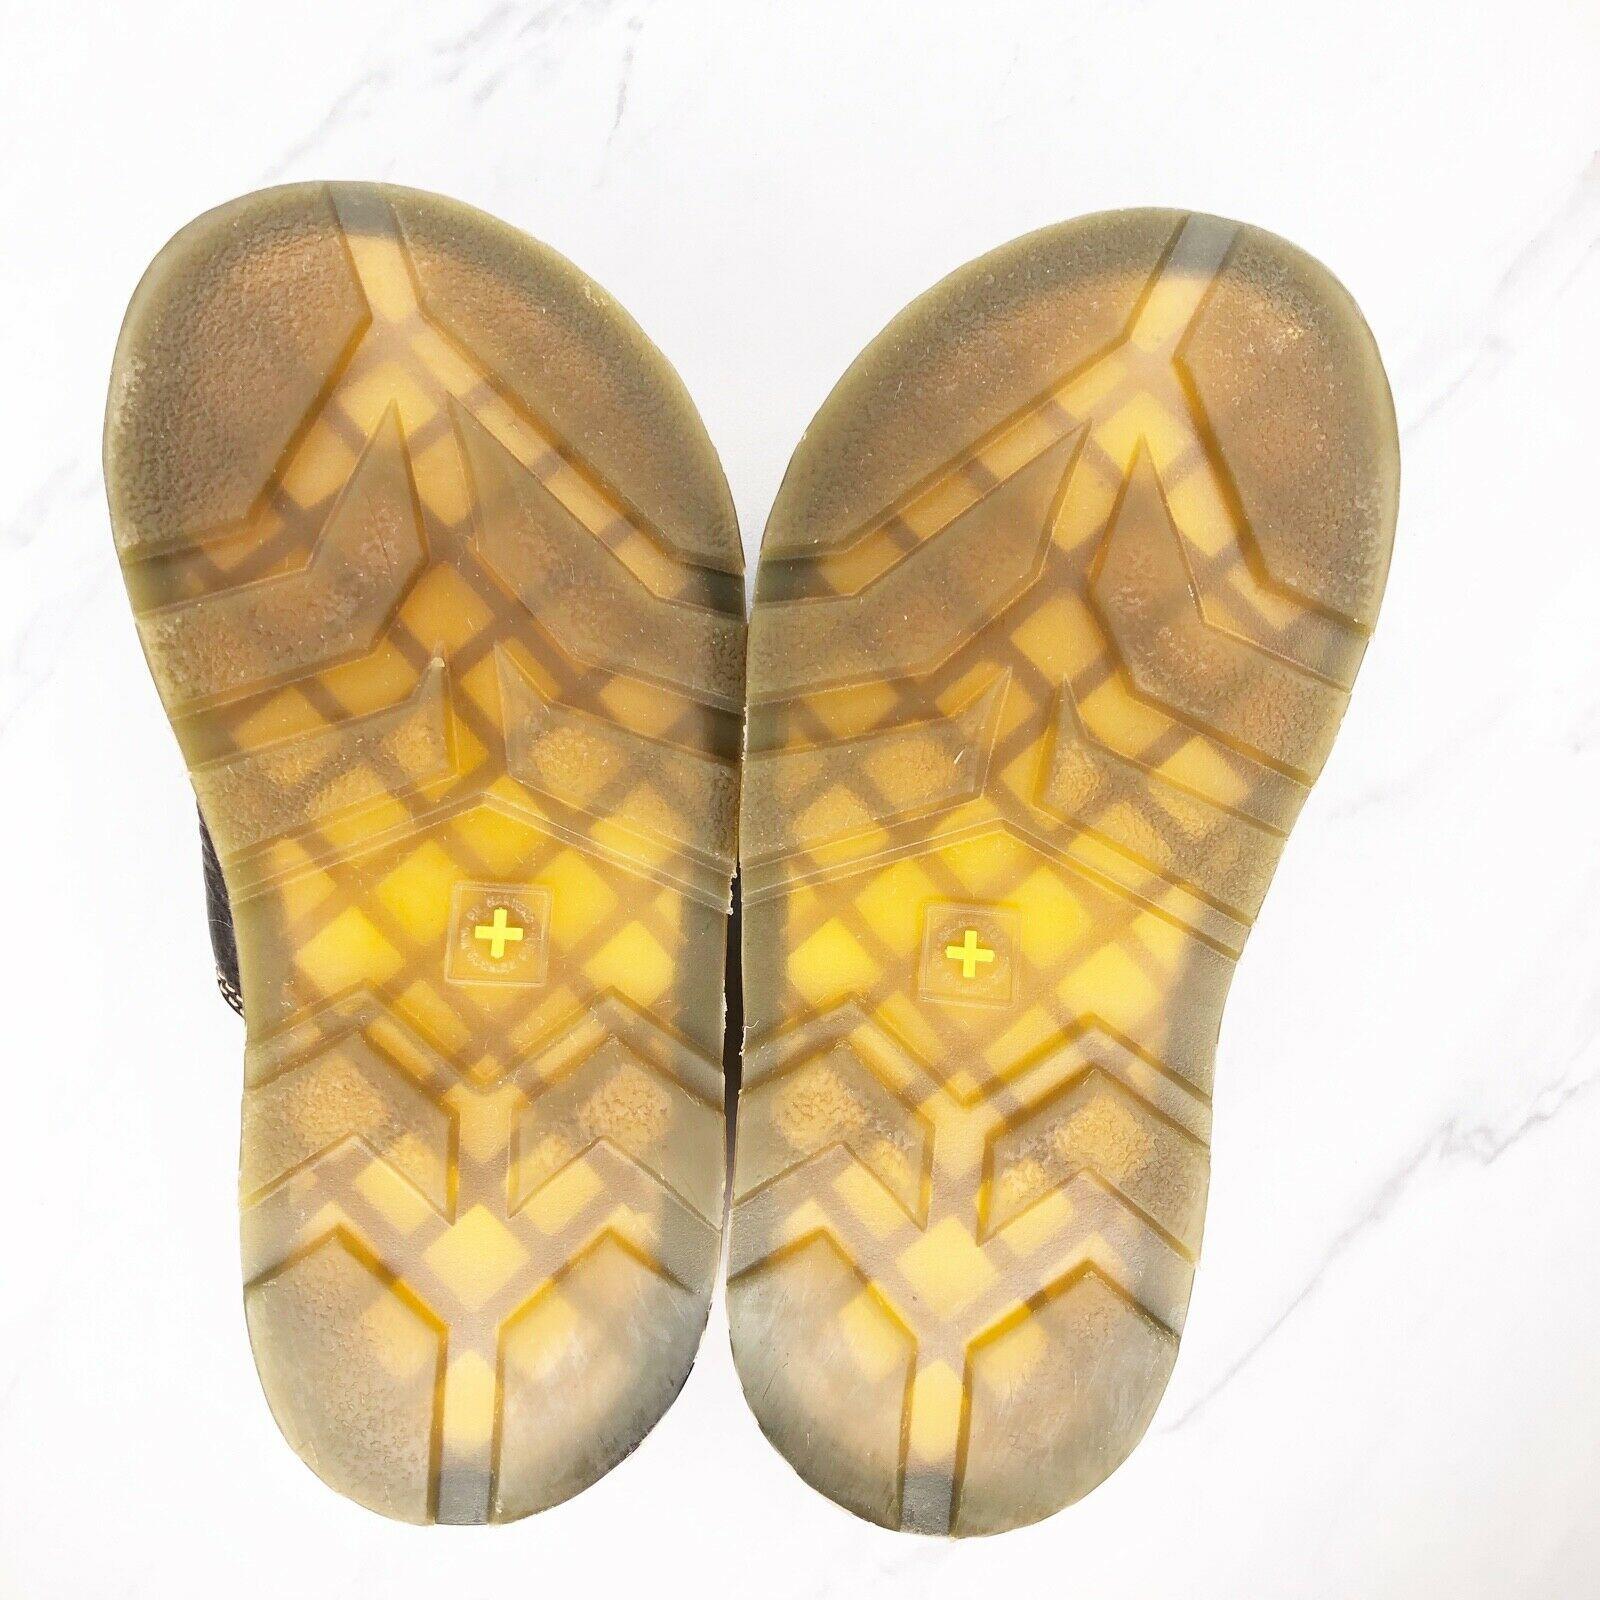 Dr. Martens Women's 6 M Brown Leather Sandals Slides Shoes image 6